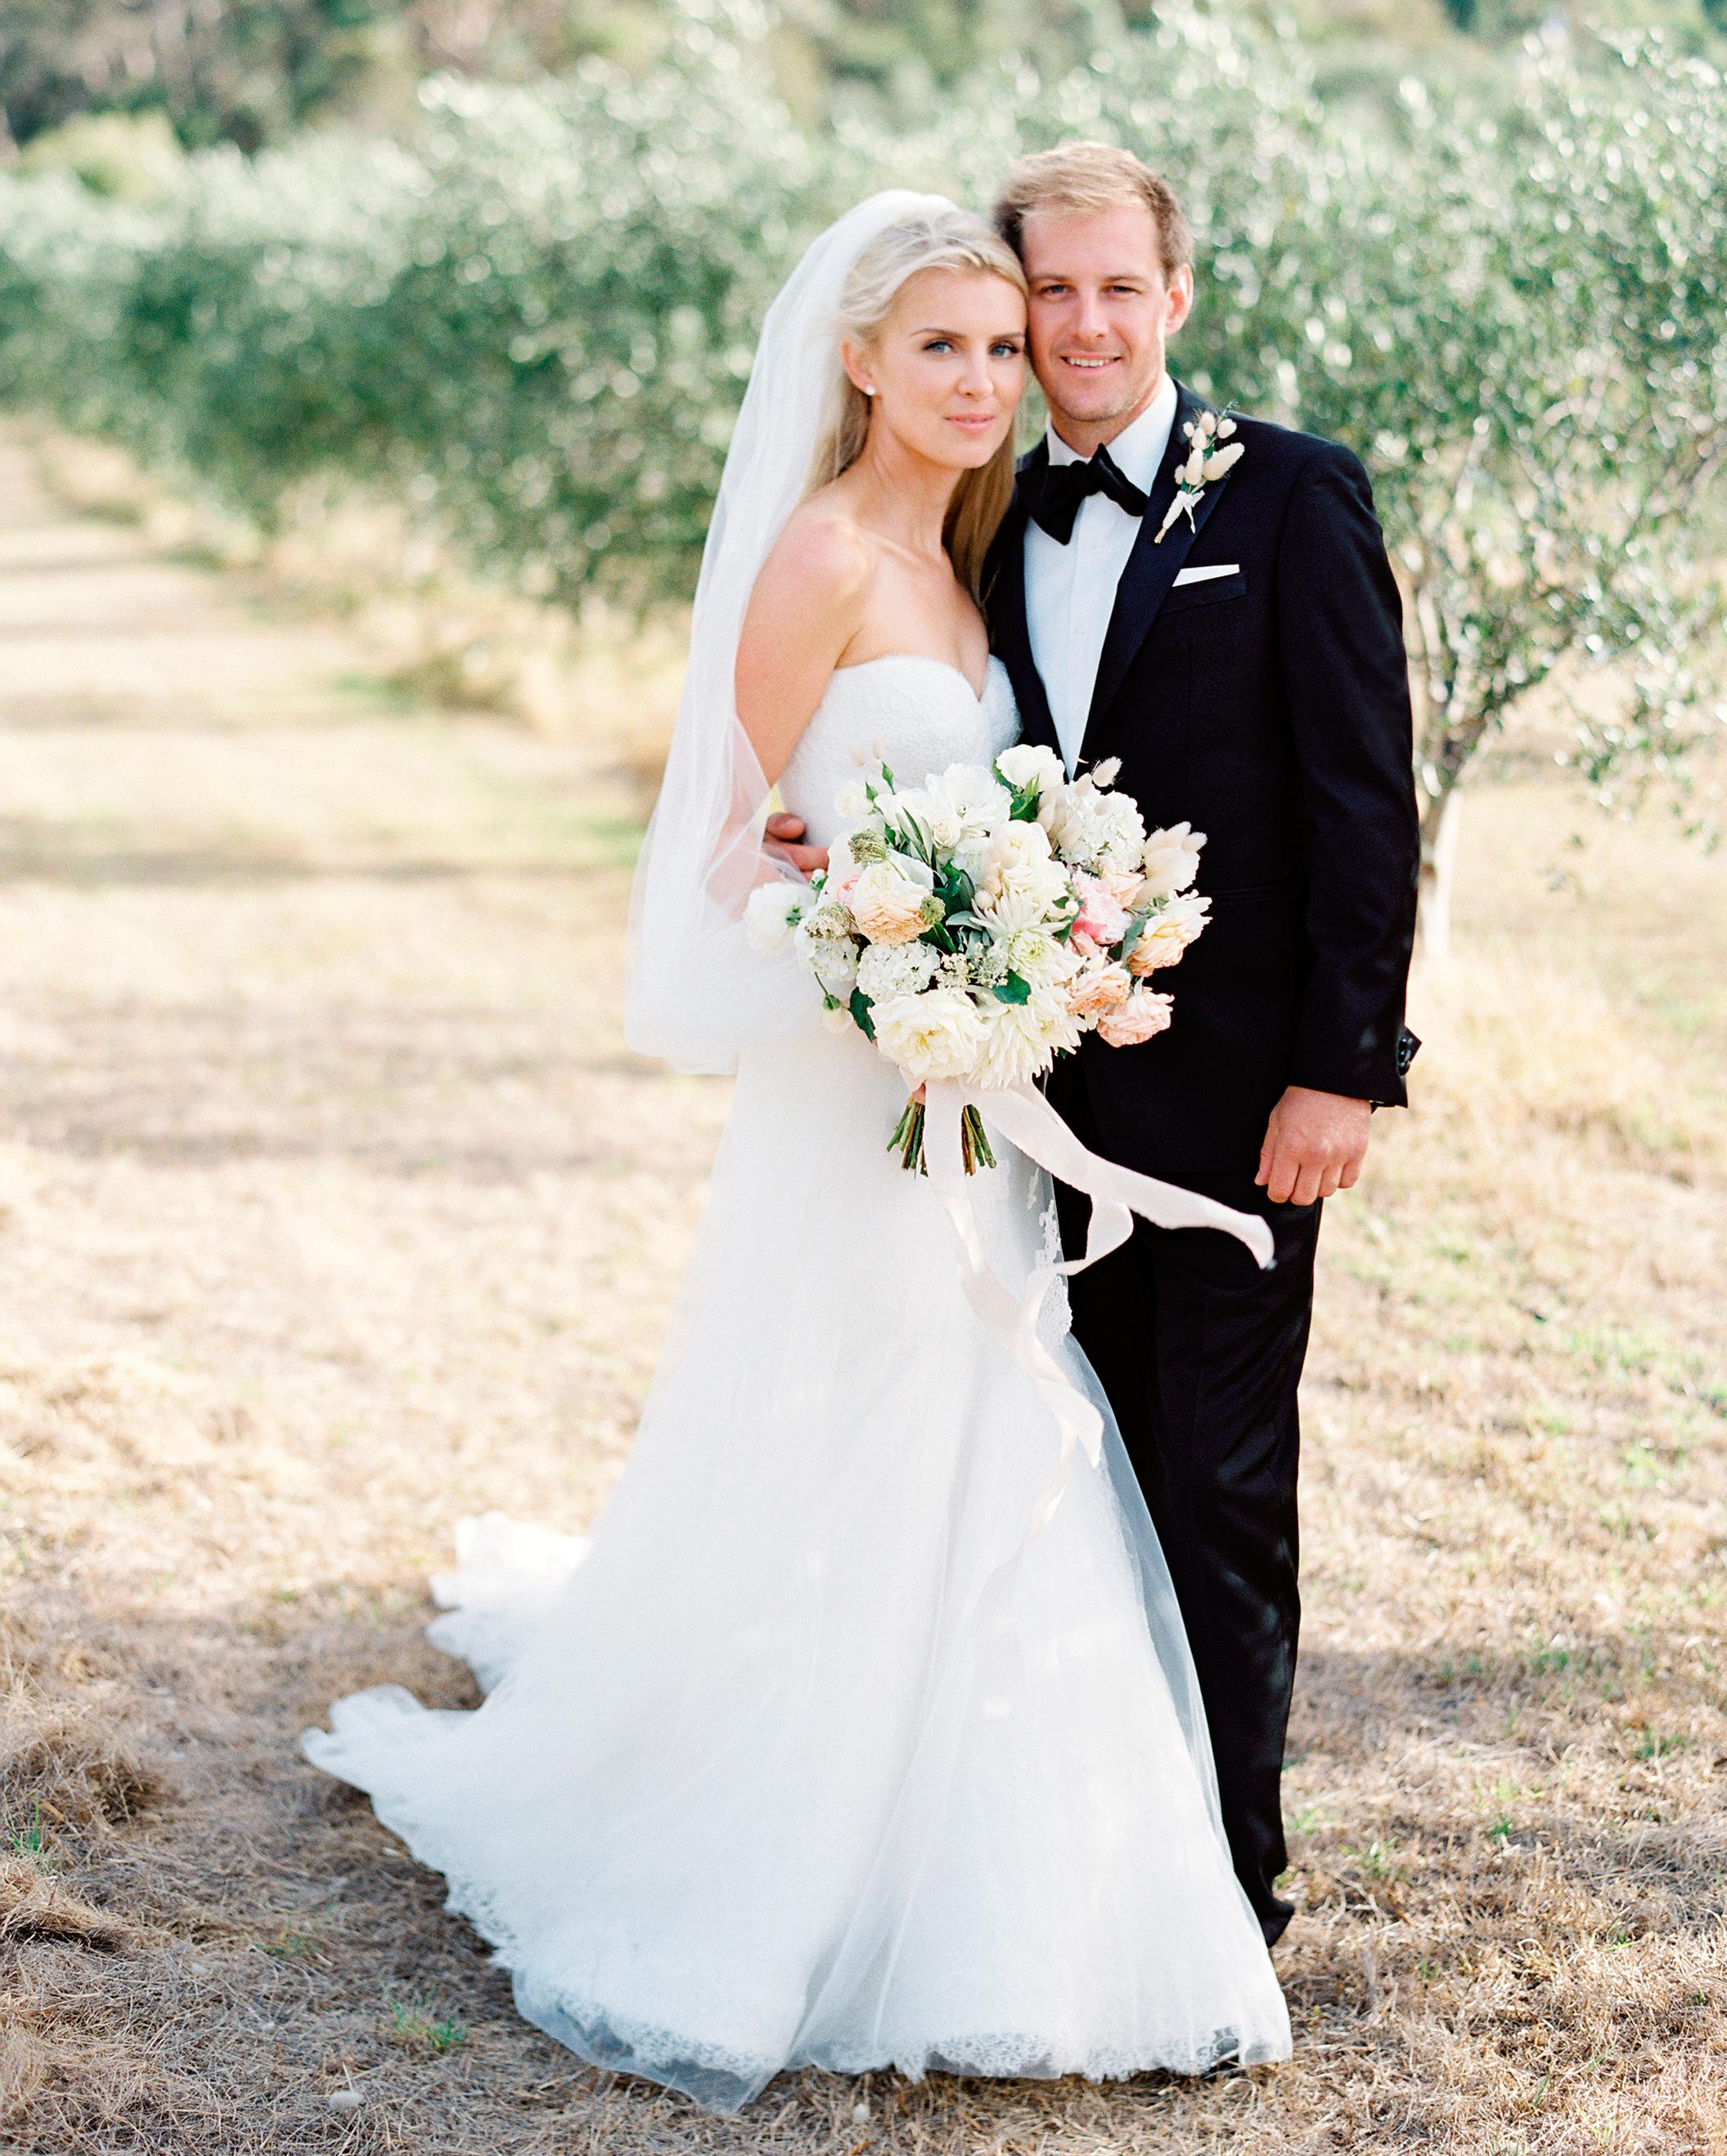 jemma-michael-wedding-couple-002616014-s112110-0815.jpg